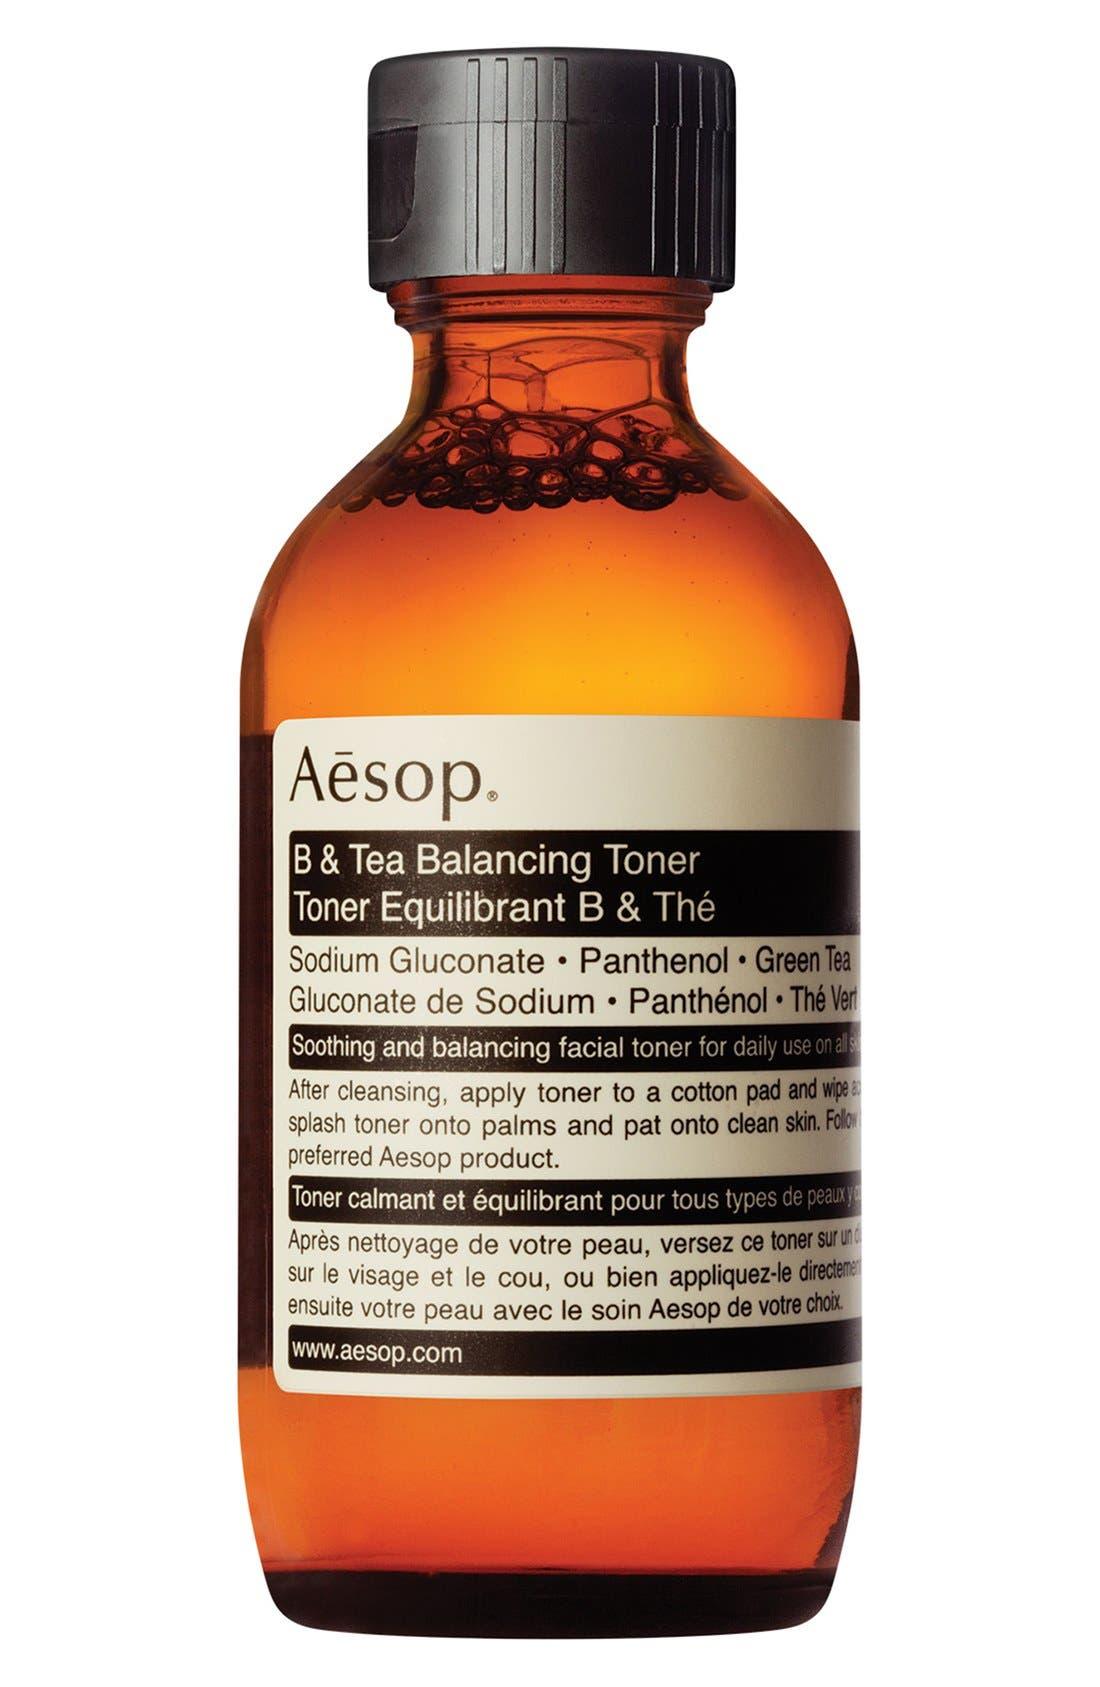 Aesop B & Tea Balancing Toner